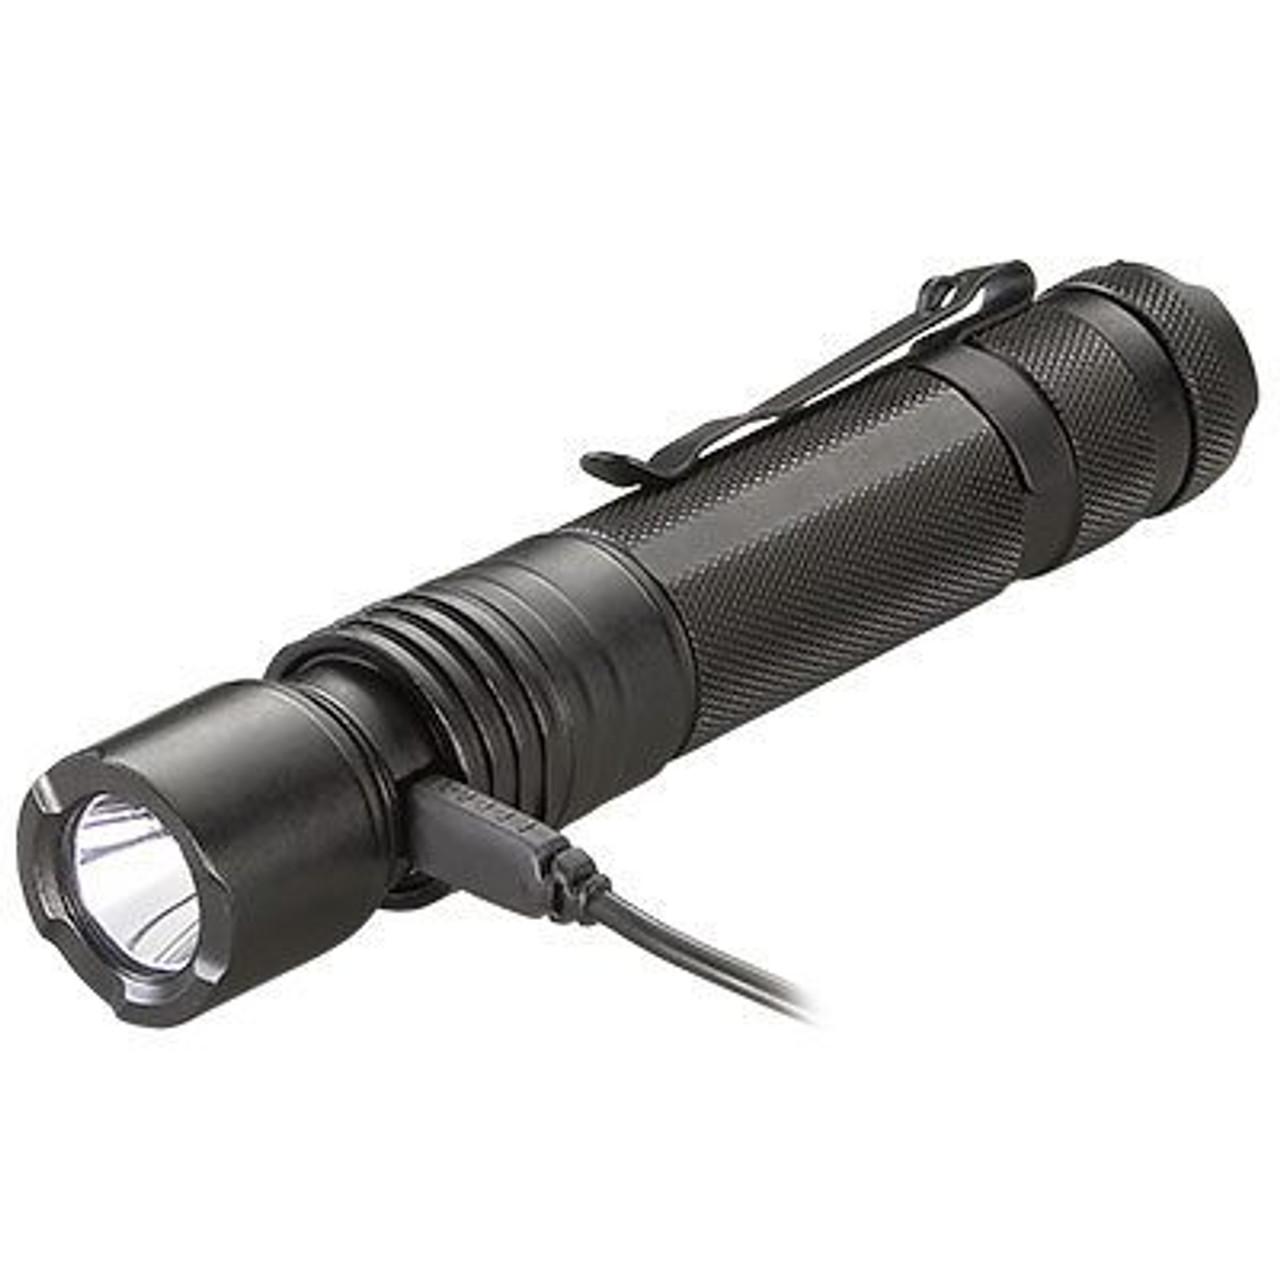 Streamlight 88052 ProTac HL USB 850 Lumen C4 LED Flashlight with High//Low//Strobe